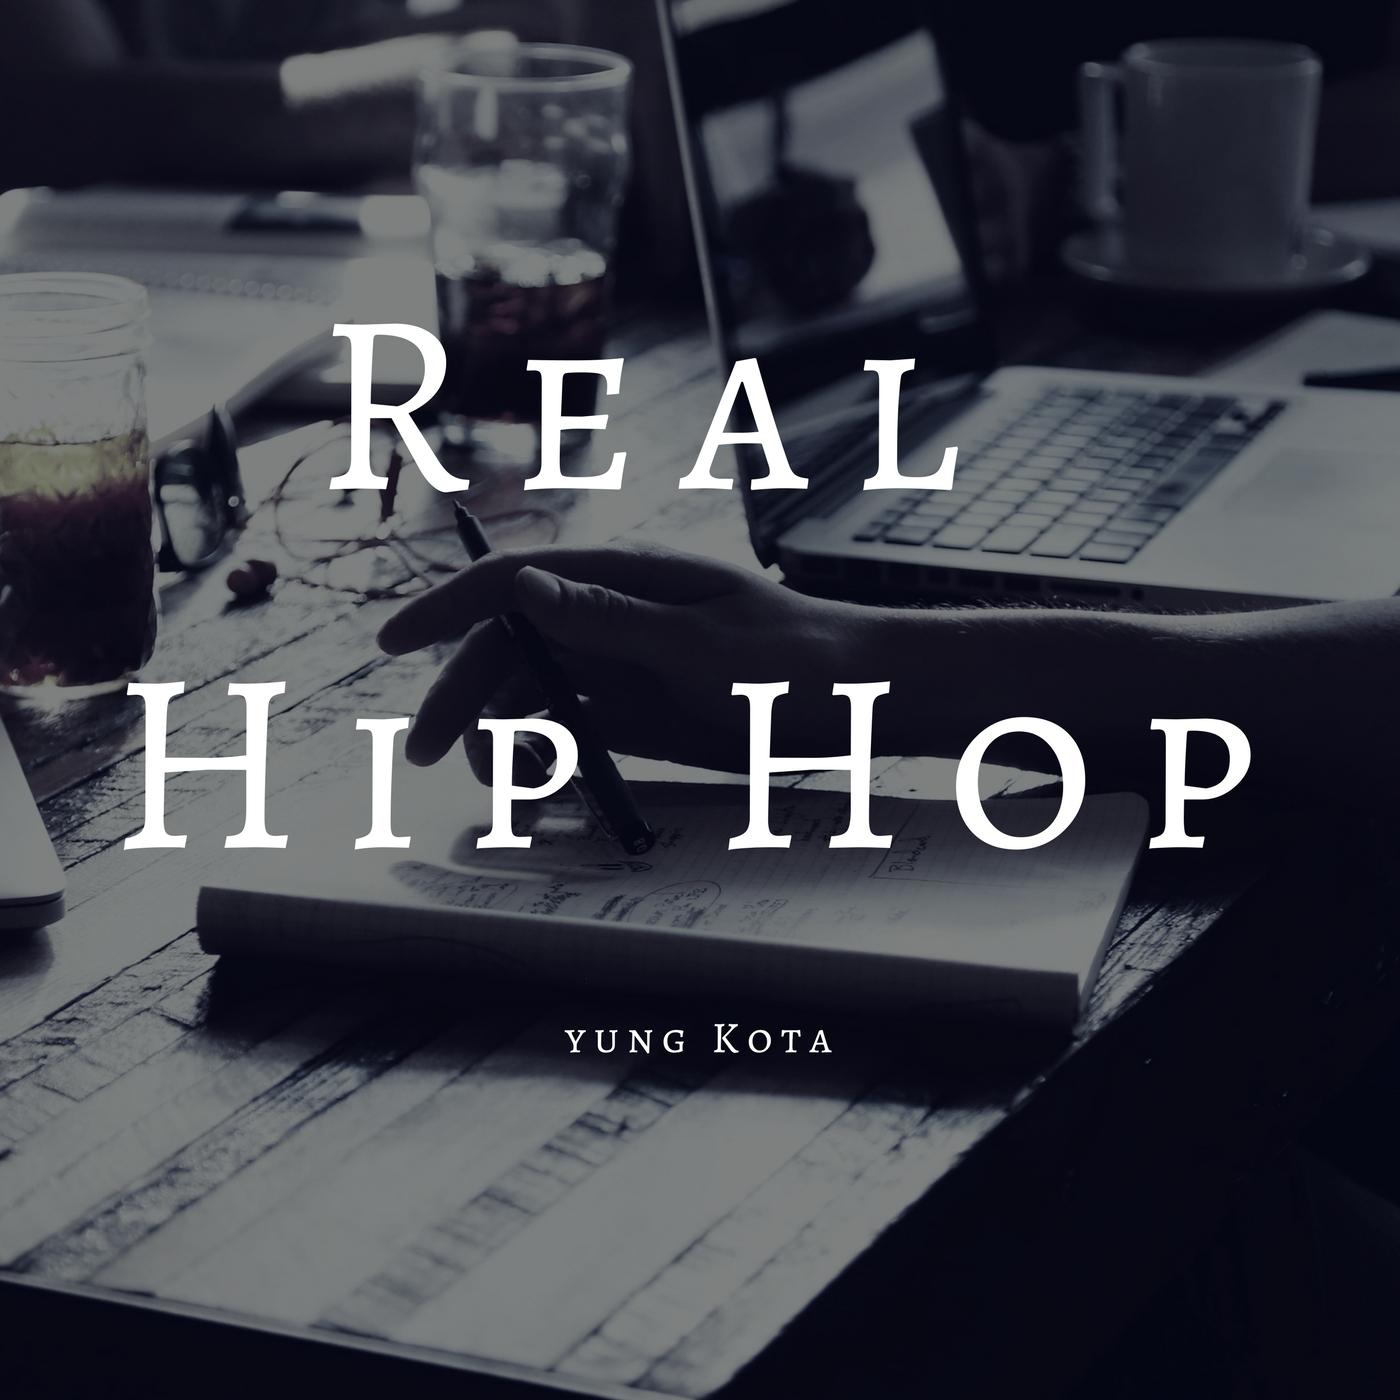 Yung Kota - Icon remix